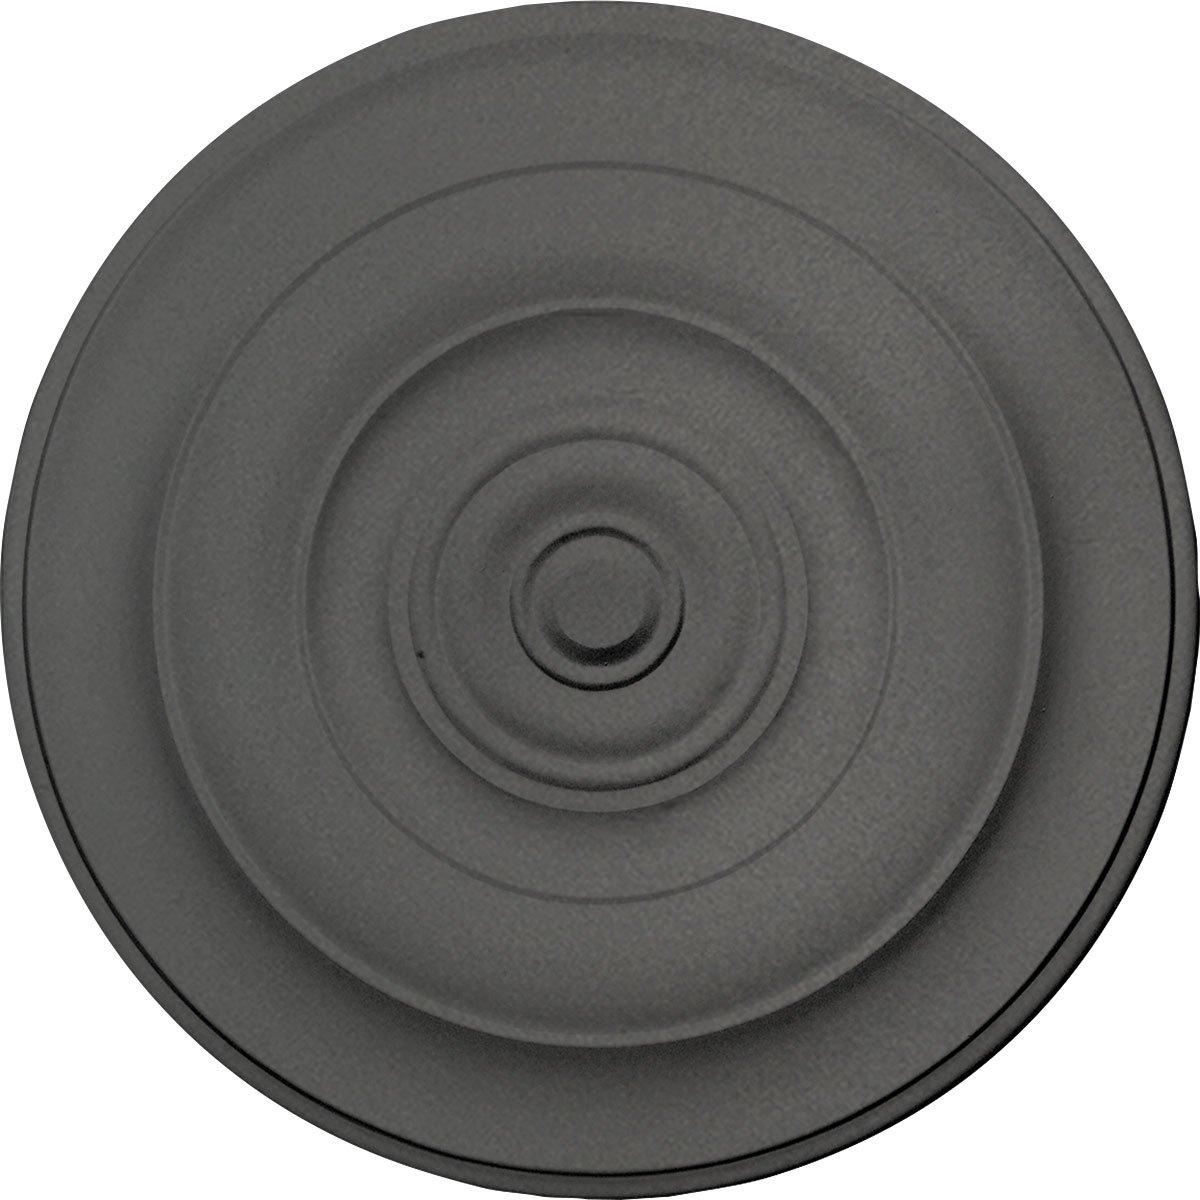 Ekena Millwork CM18NISGS Niobe Ceiling Medallion, 18'' OD x 1 1/2'' P, Steel Gray